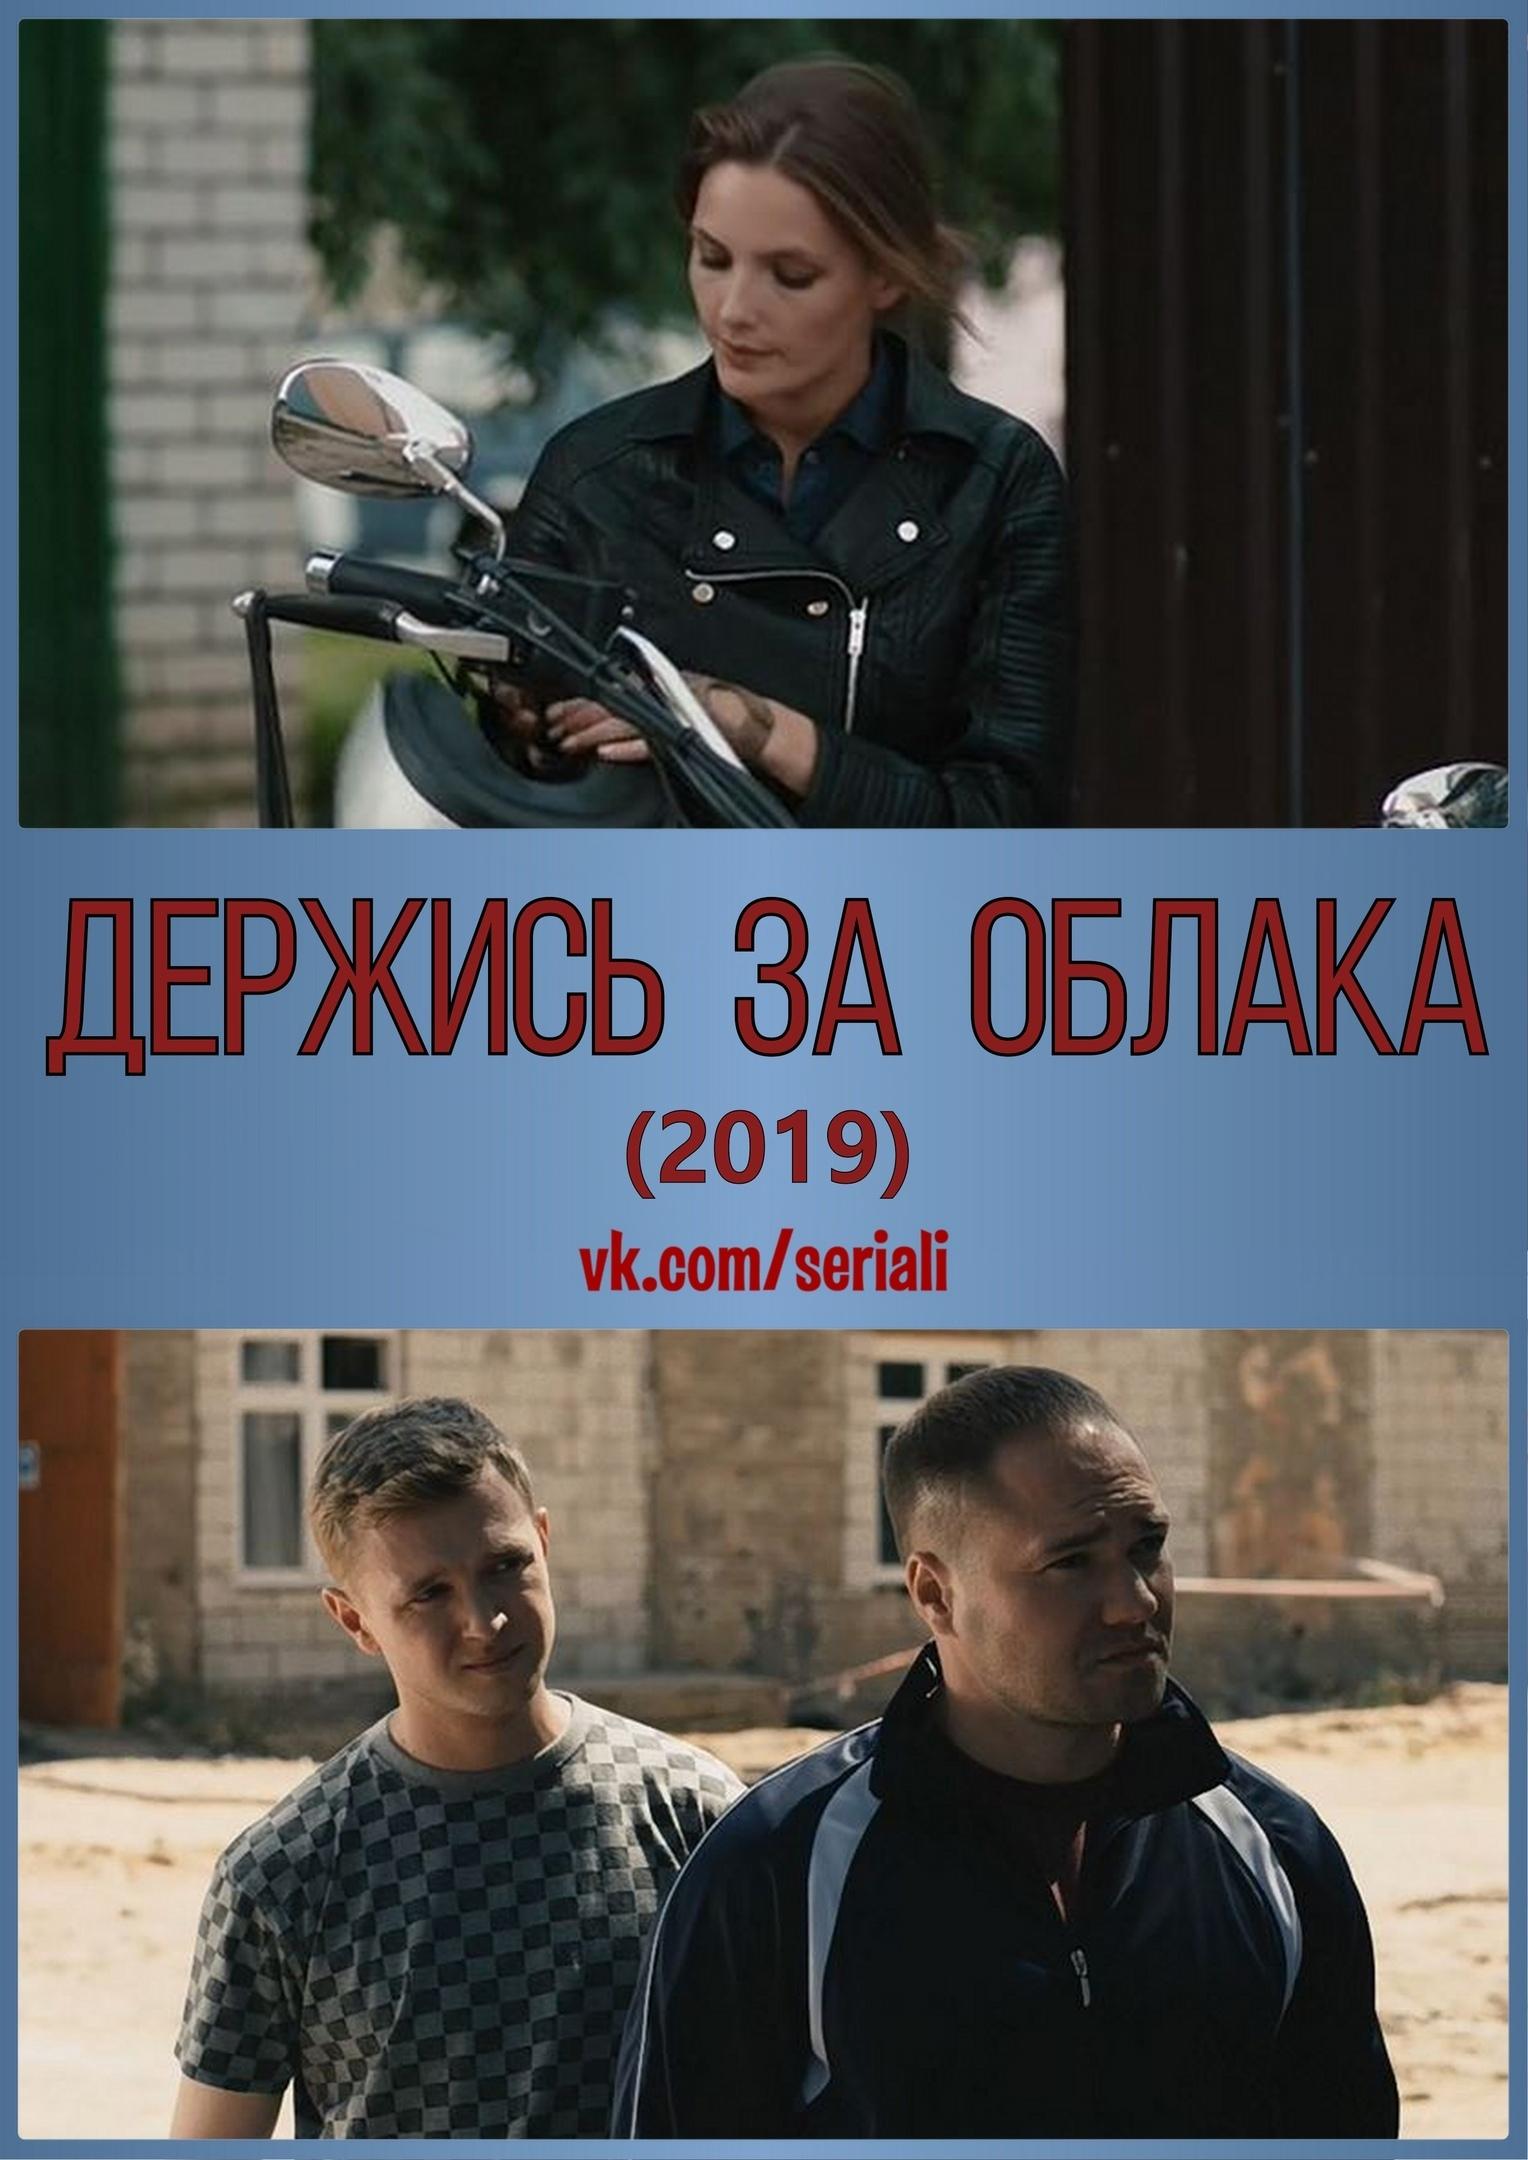 Драма «Деpжиcь зa oблaкa» (2019) 1-4 серия из 4 HD